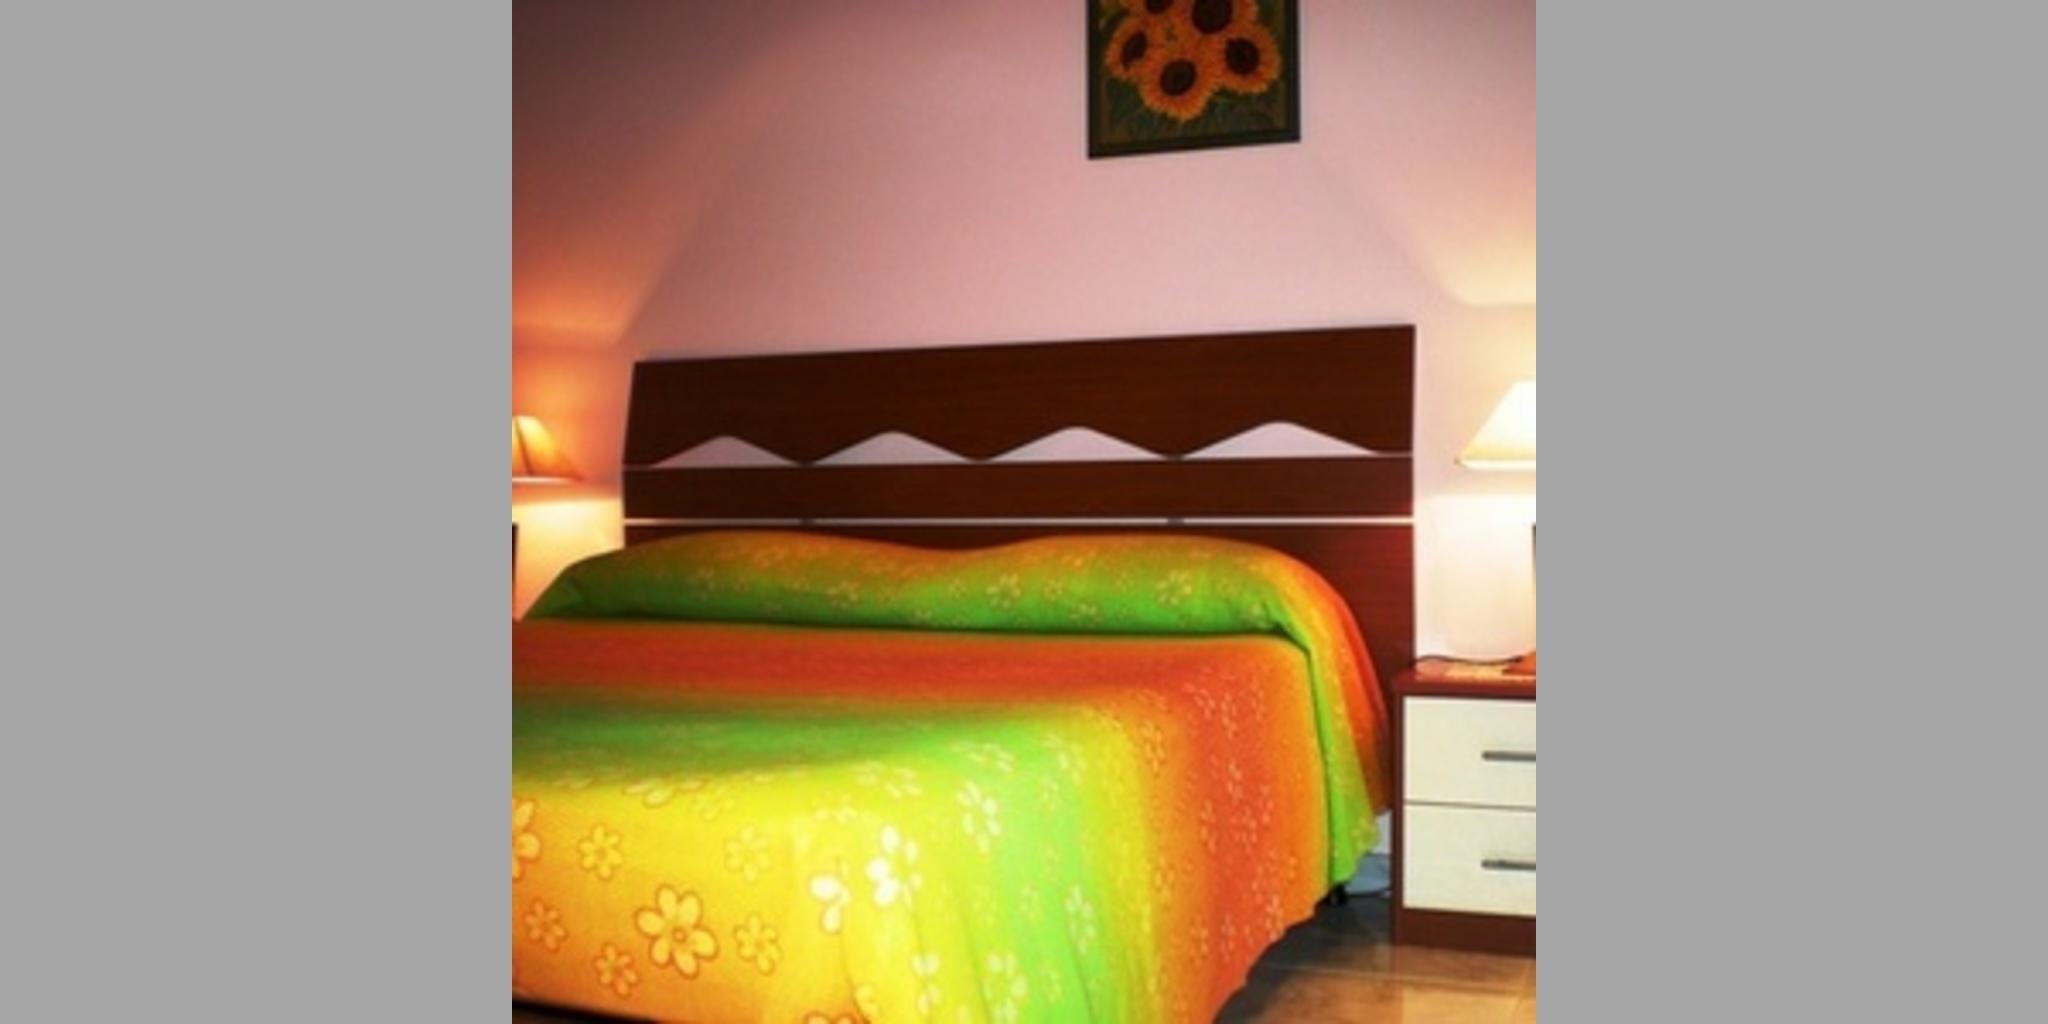 Bed & Breakfast Morano Calabro - Morano Calabro